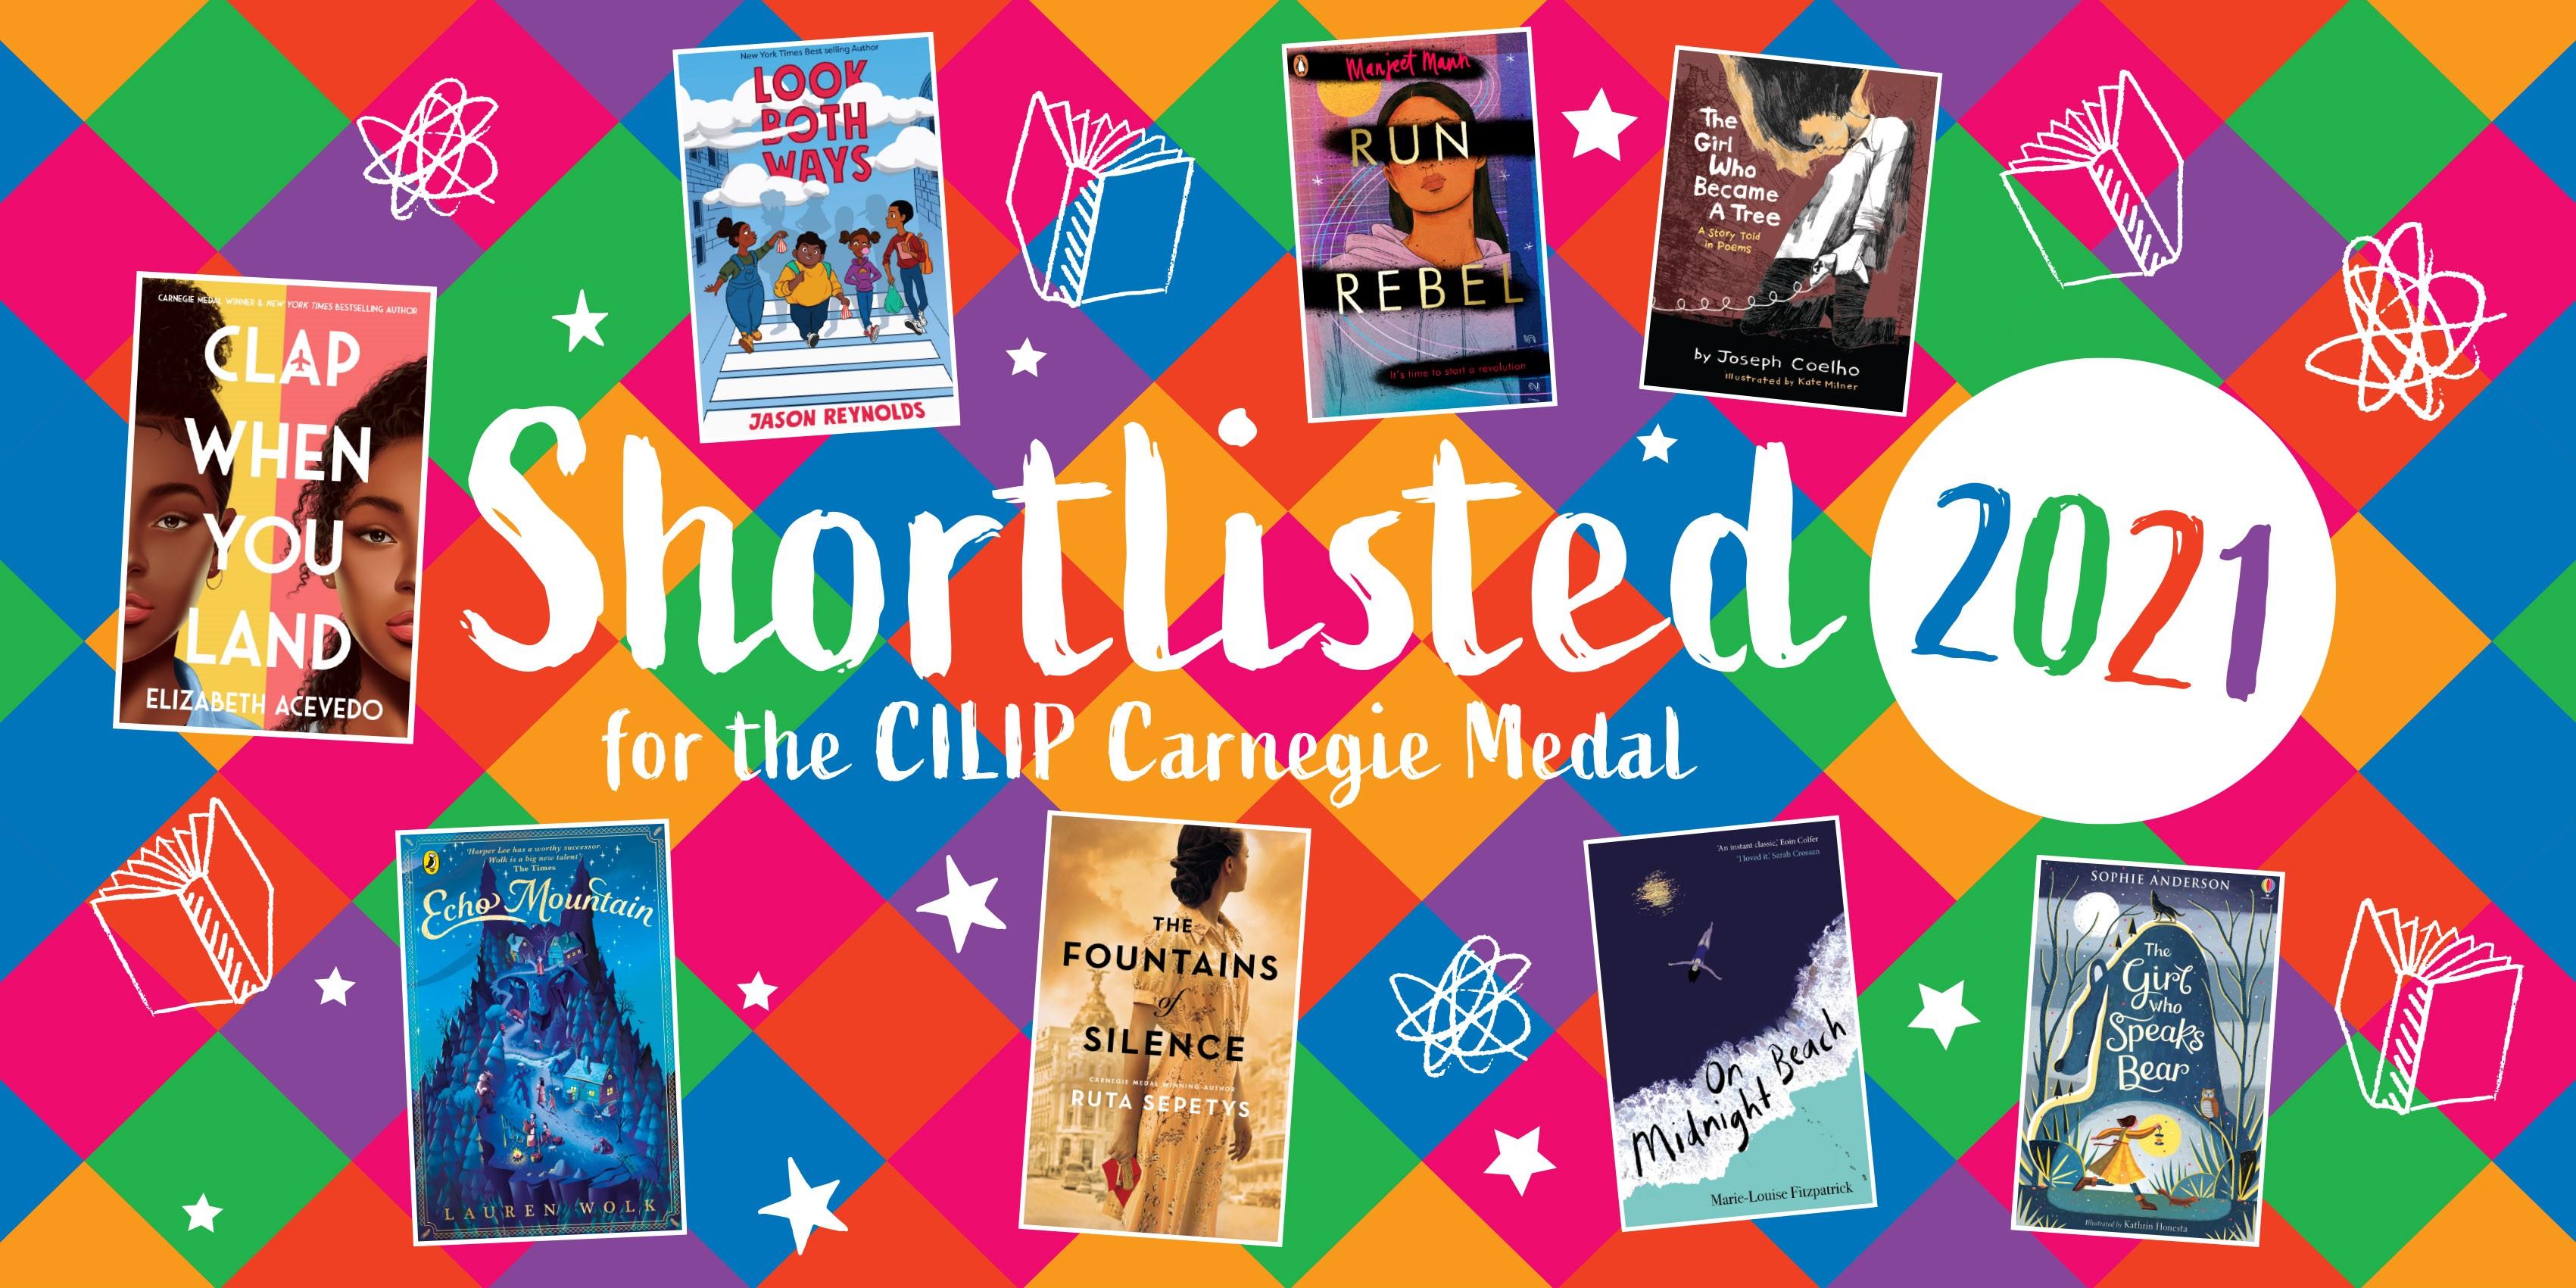 Carnegie Medal shortlist 2021